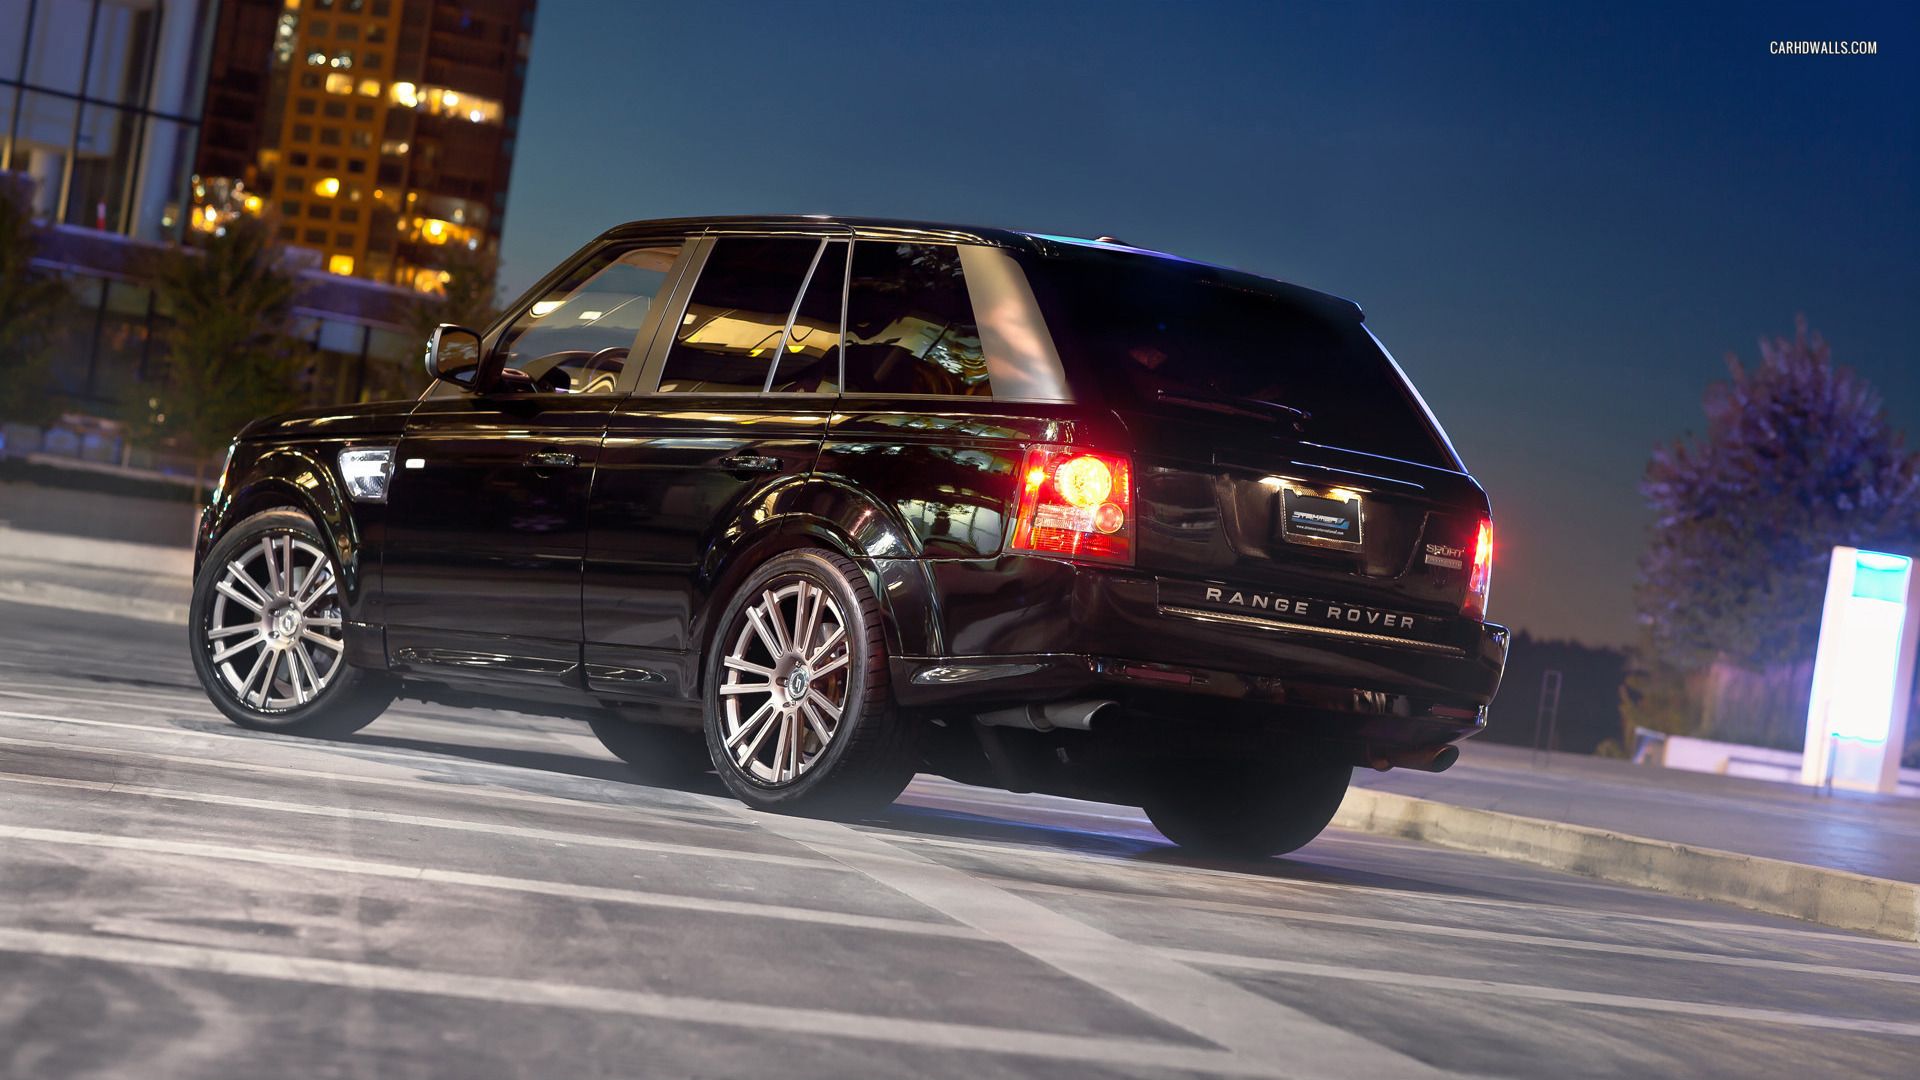 Ultra Hd K Range Rover Wallpapers Hd Desktop Backgrounds 1920x1080